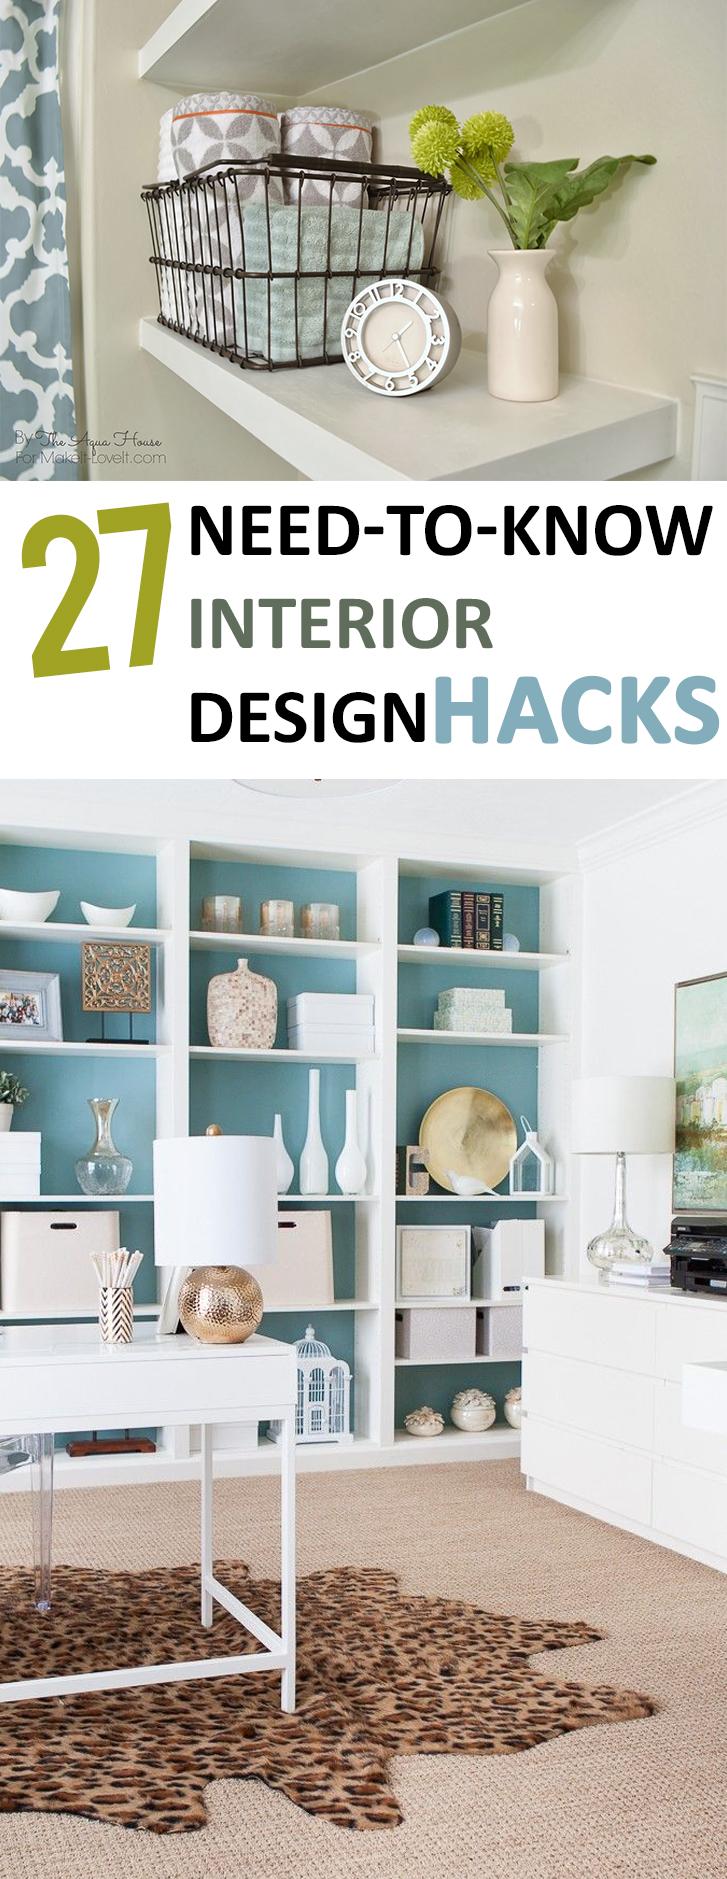 pin-27-need-to-know-interior-design-hacks